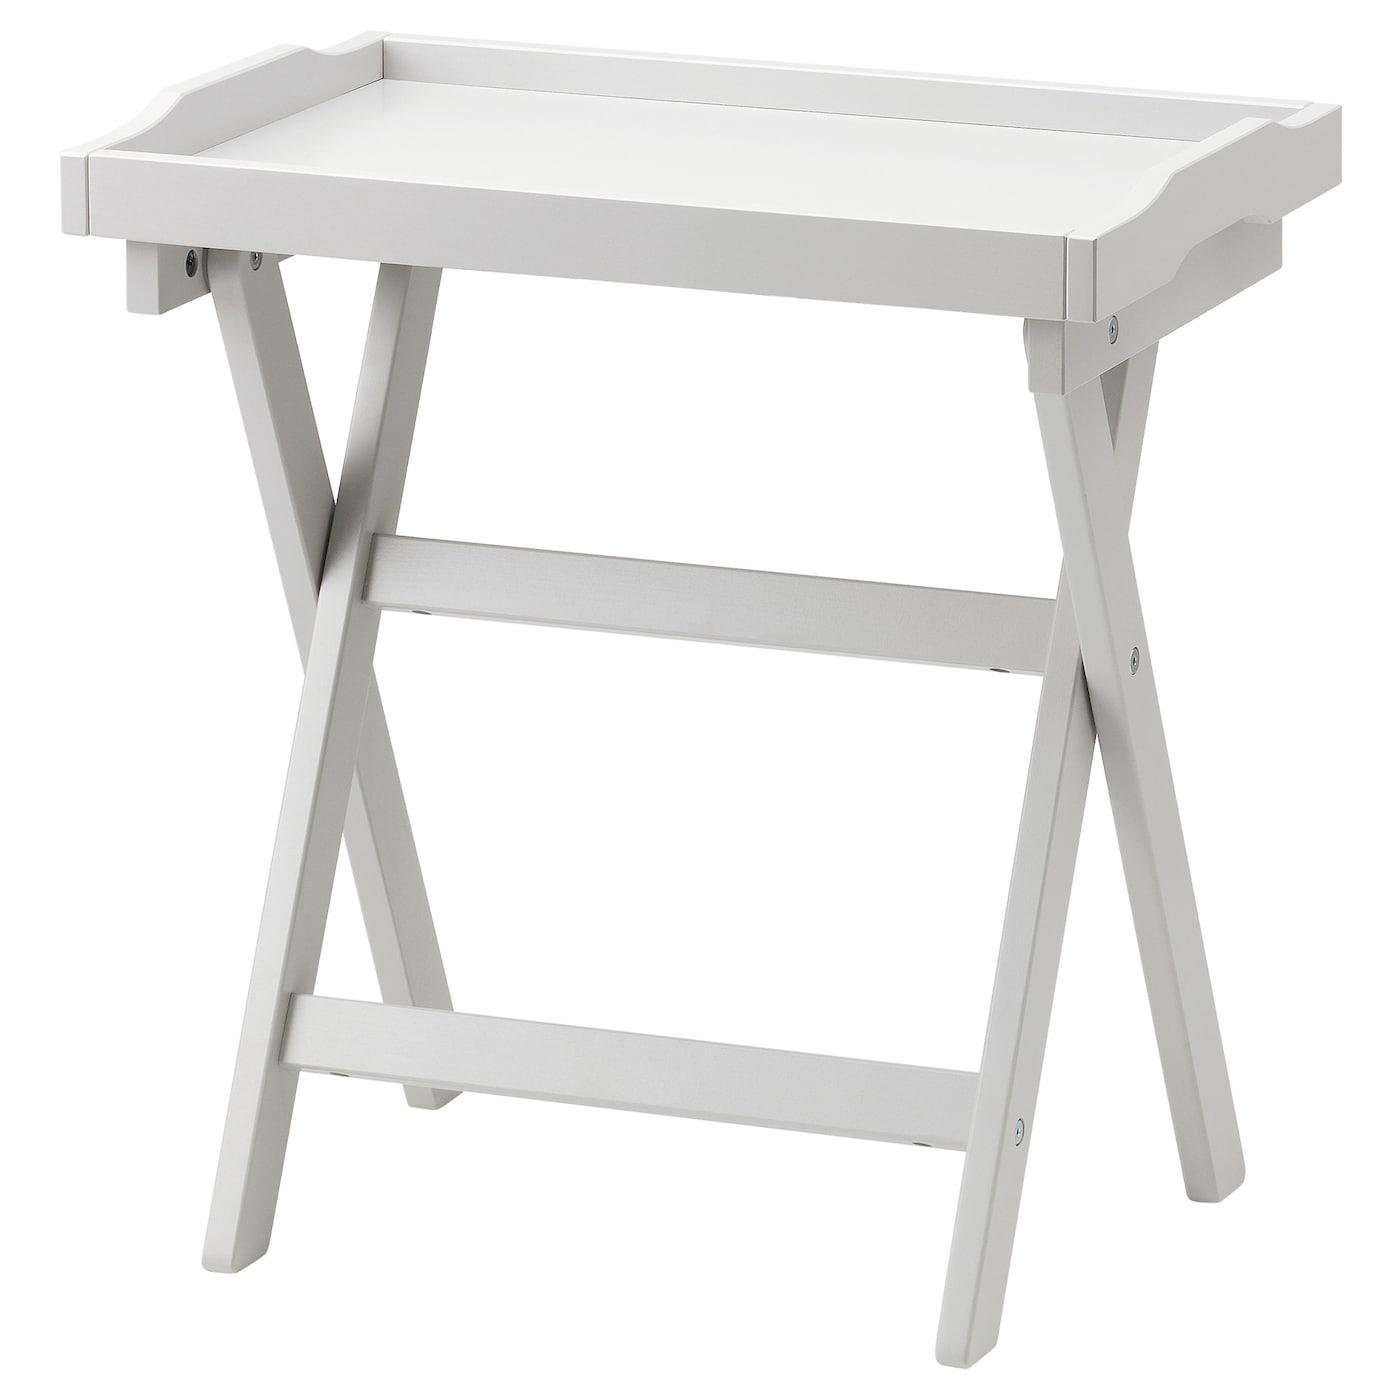 - MARYD Grey, Tray Table, 58x38x58 Cm - IKEA